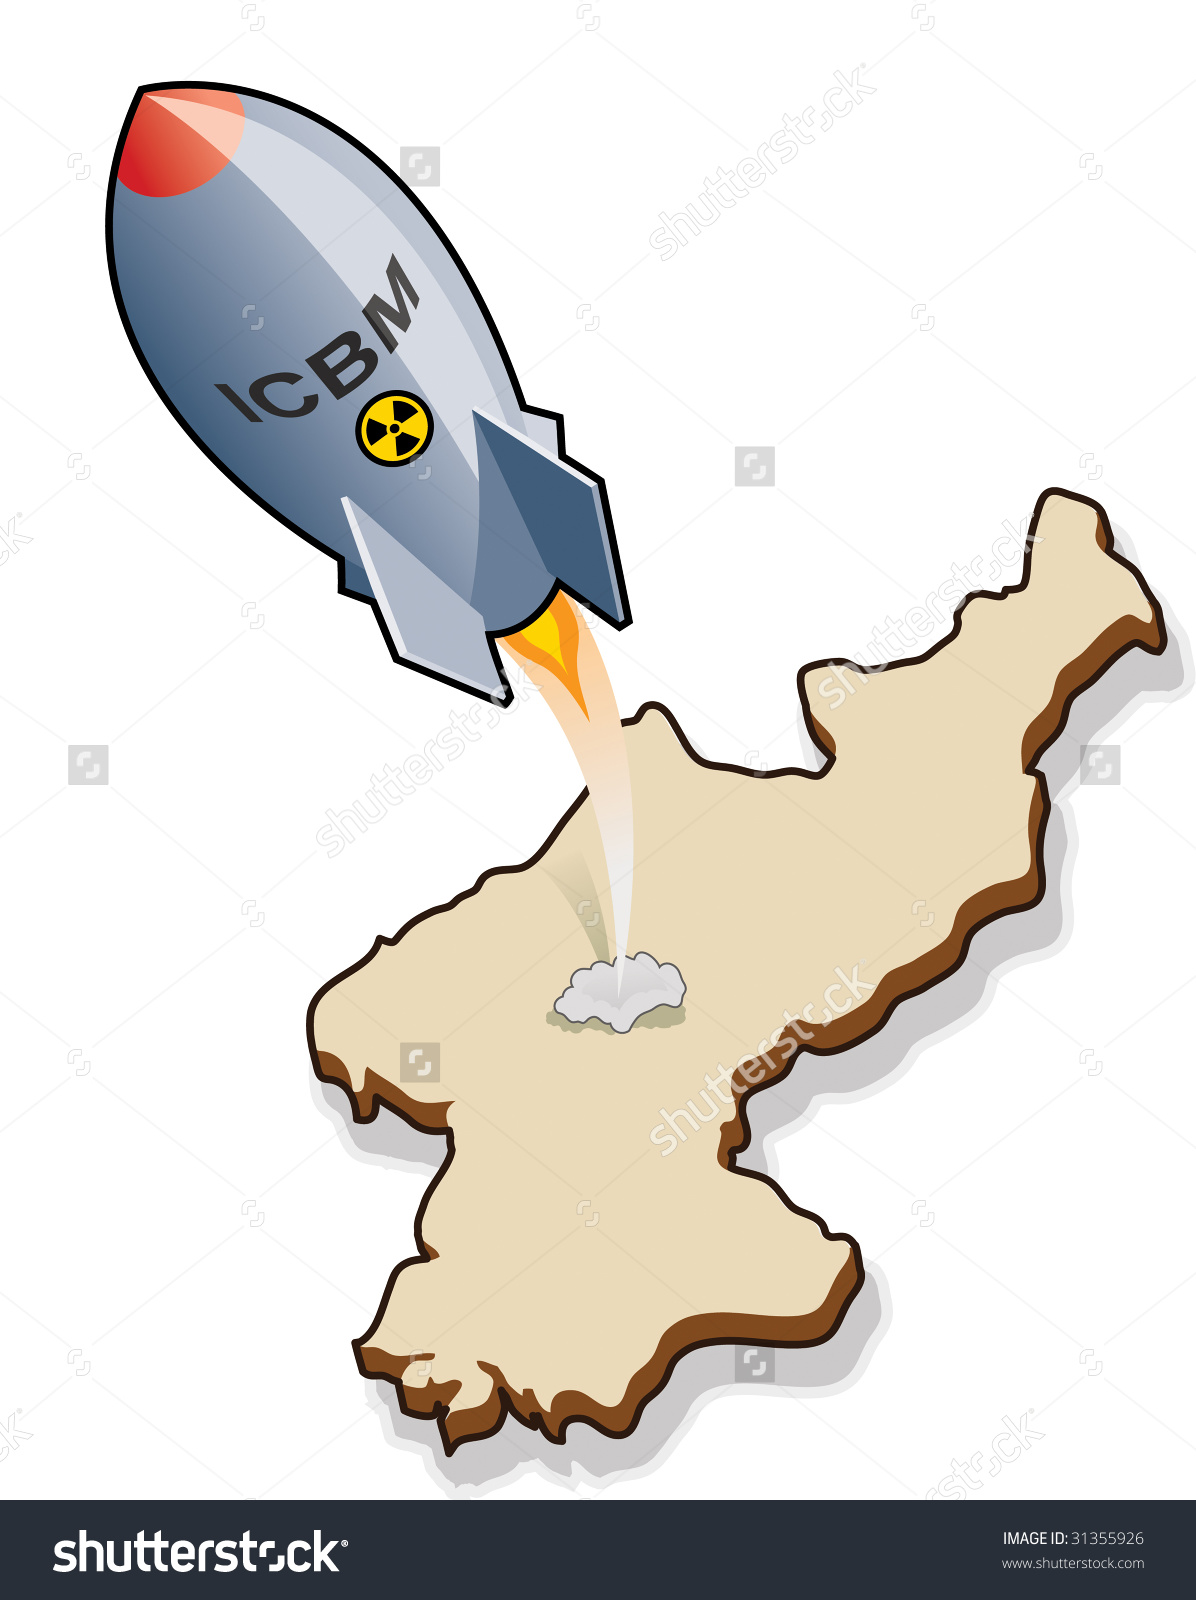 Icbm Intercontinental Ballistic Missile Launching Stock Vector.